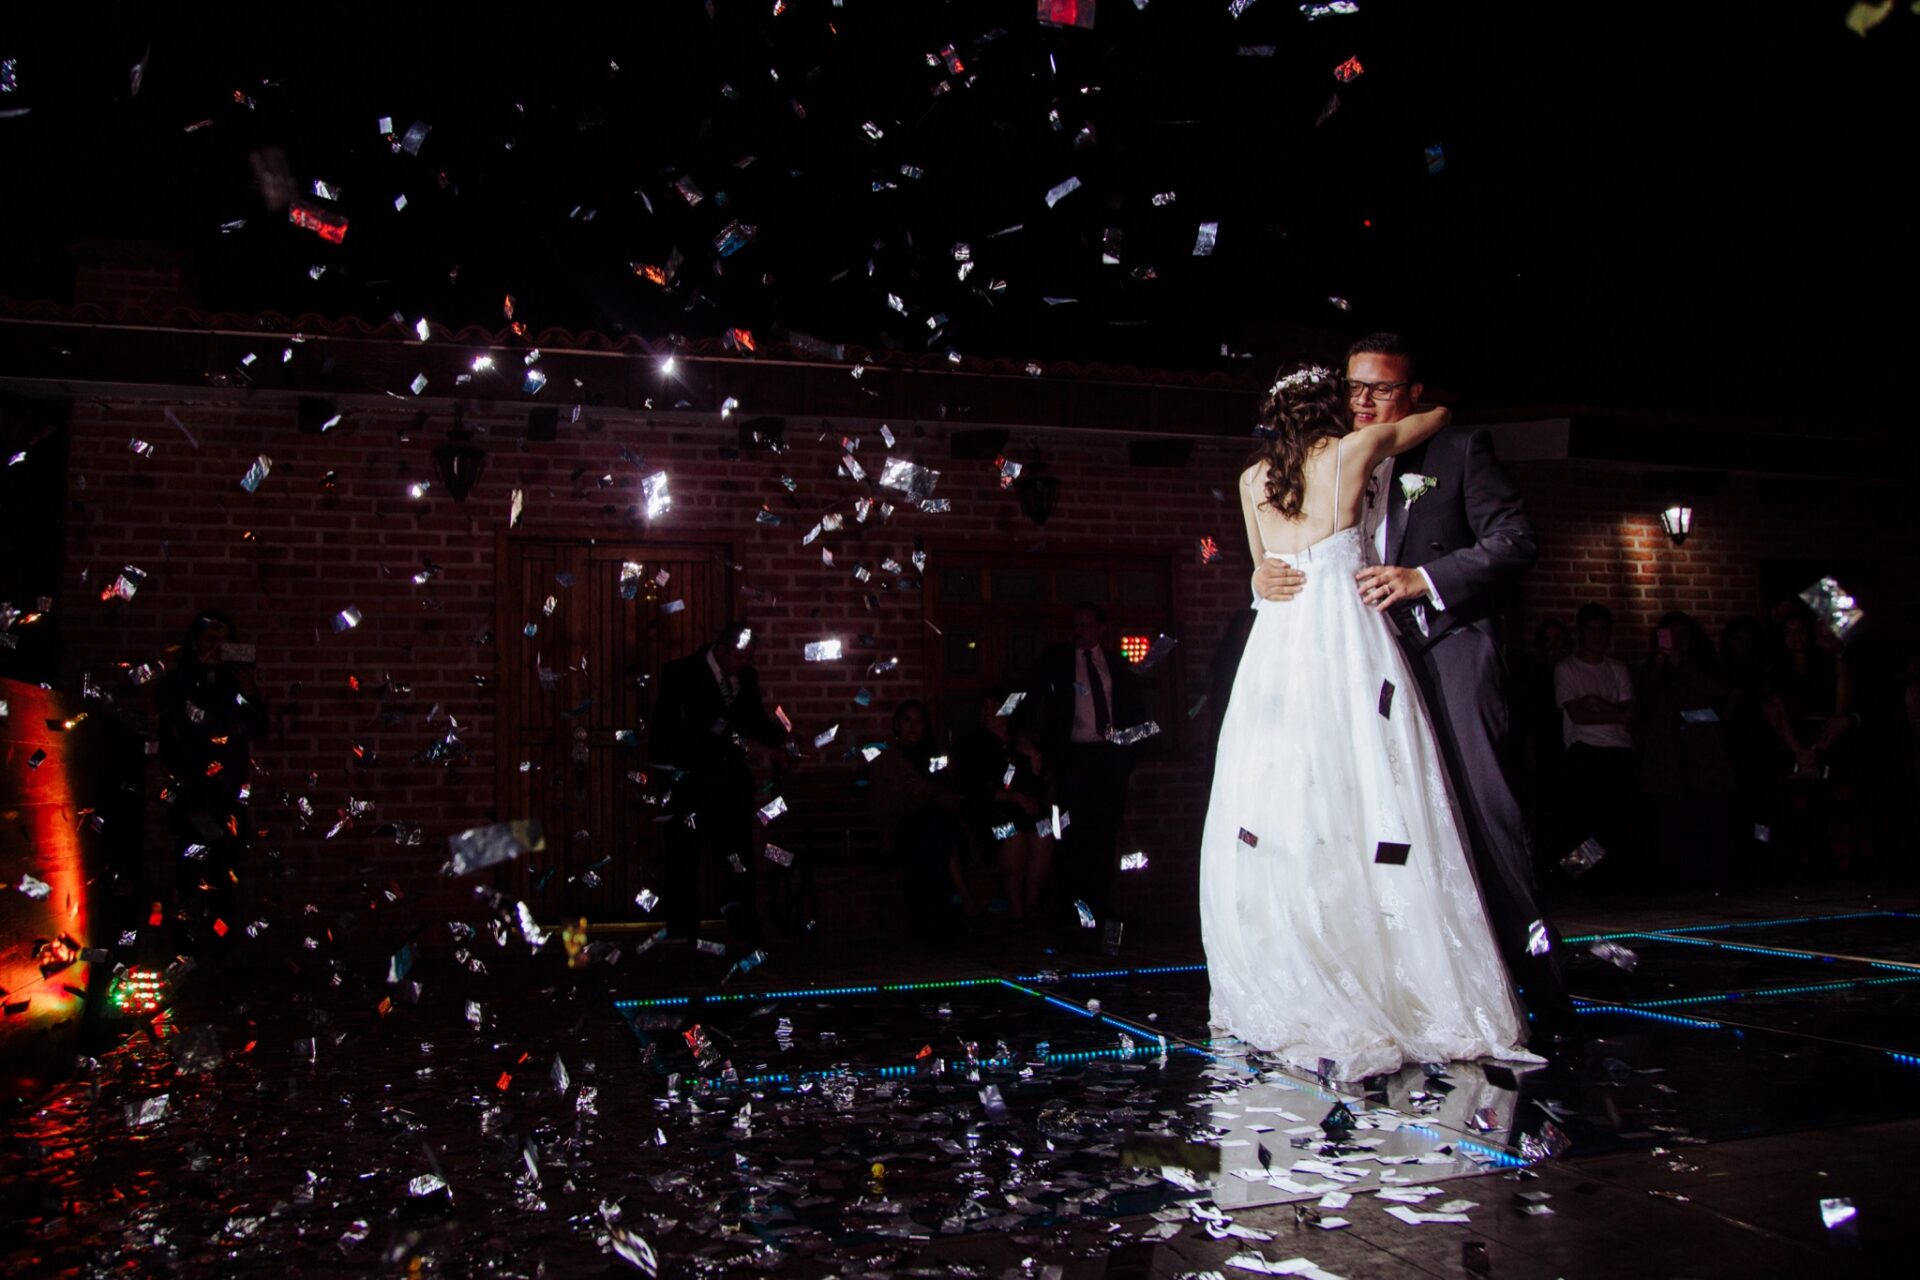 javier_noriega_fotografo_bodas_teul_zacatecas_wedding_photographer51